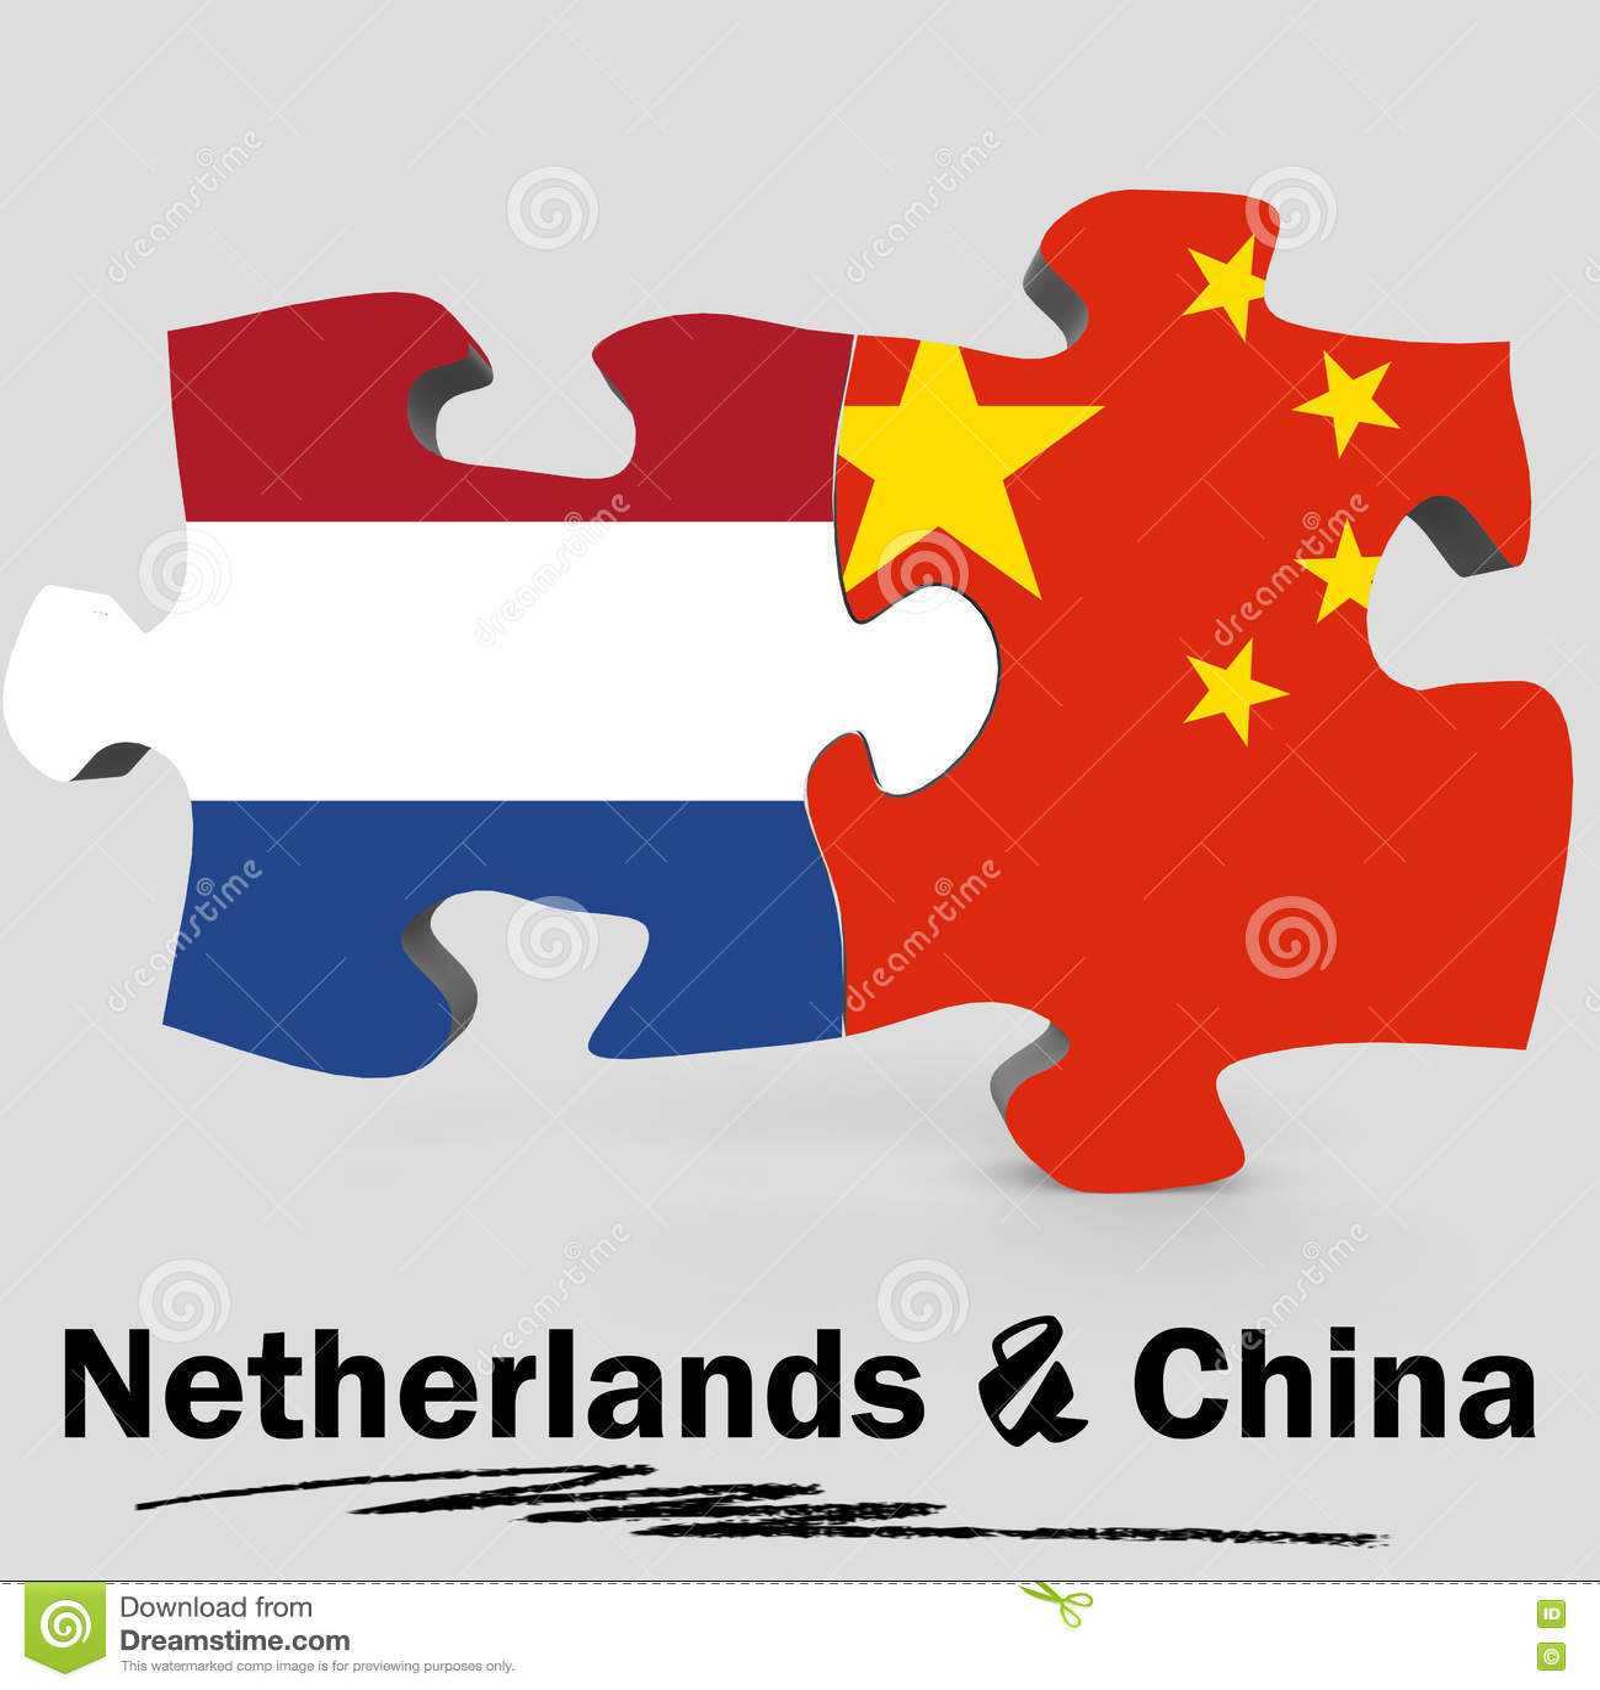 Bandeiras de China e de Países Baixos no enigma